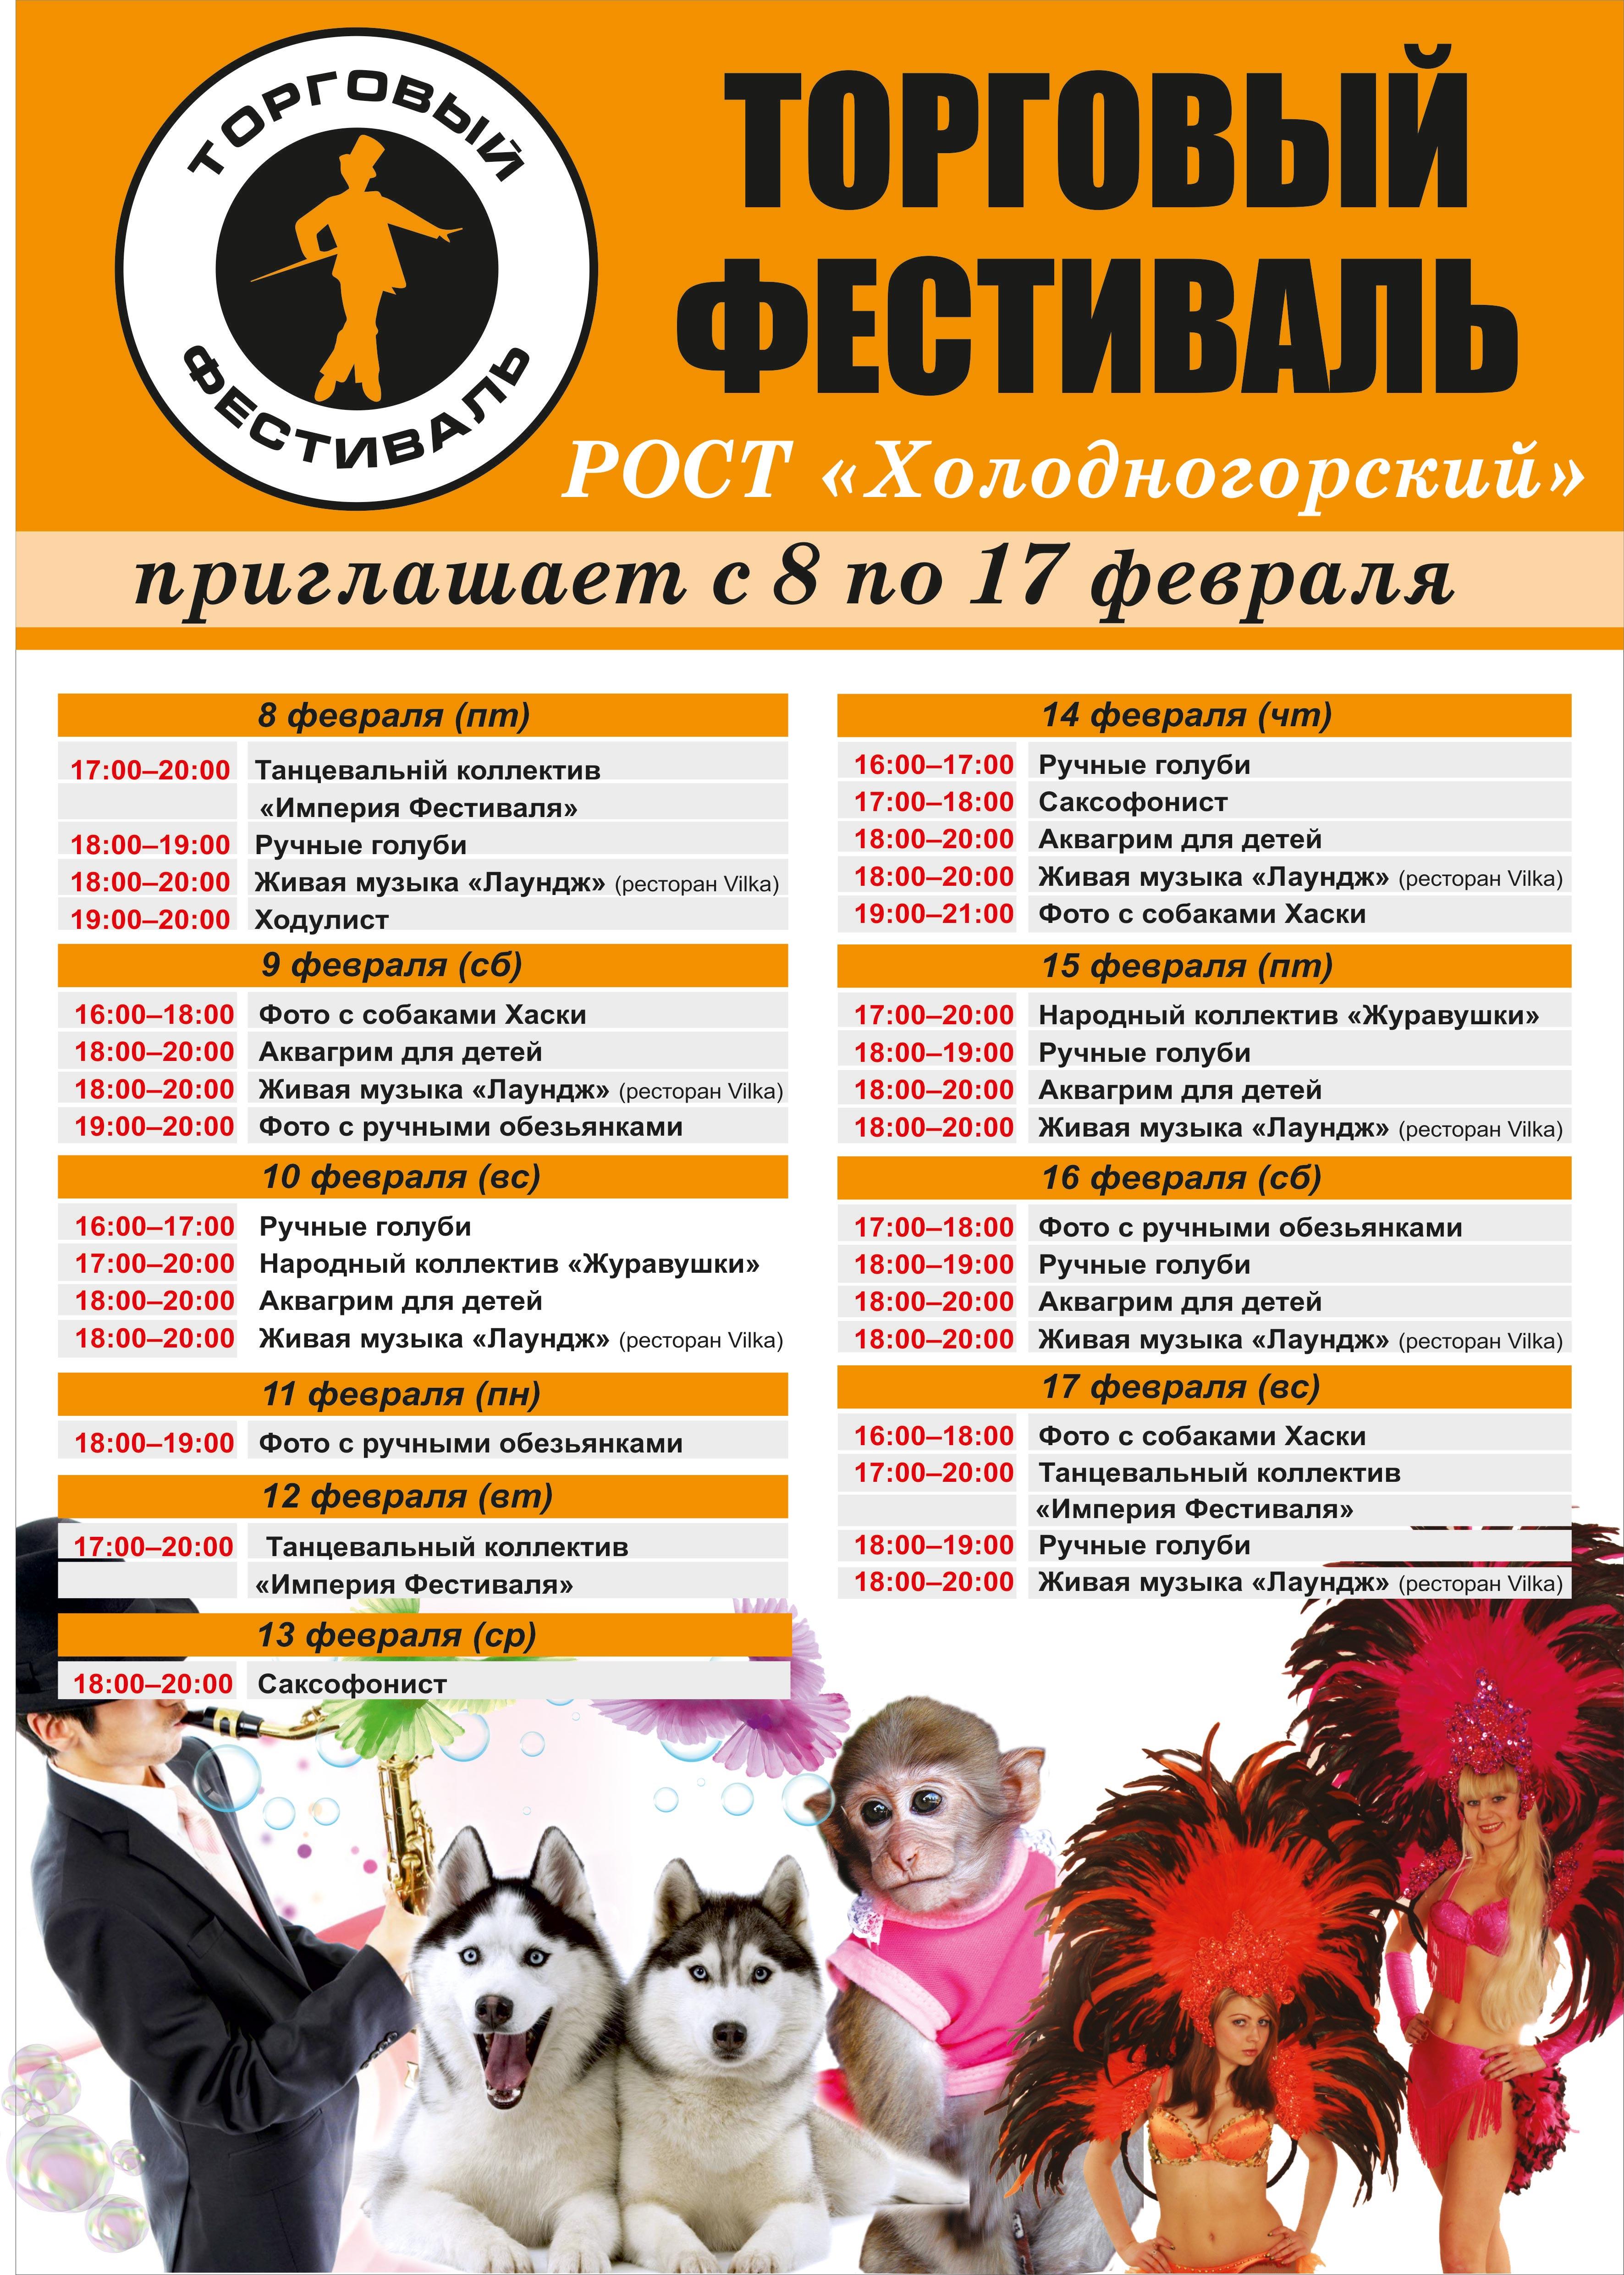 anonsholodnogorskij-a3-od-4sht